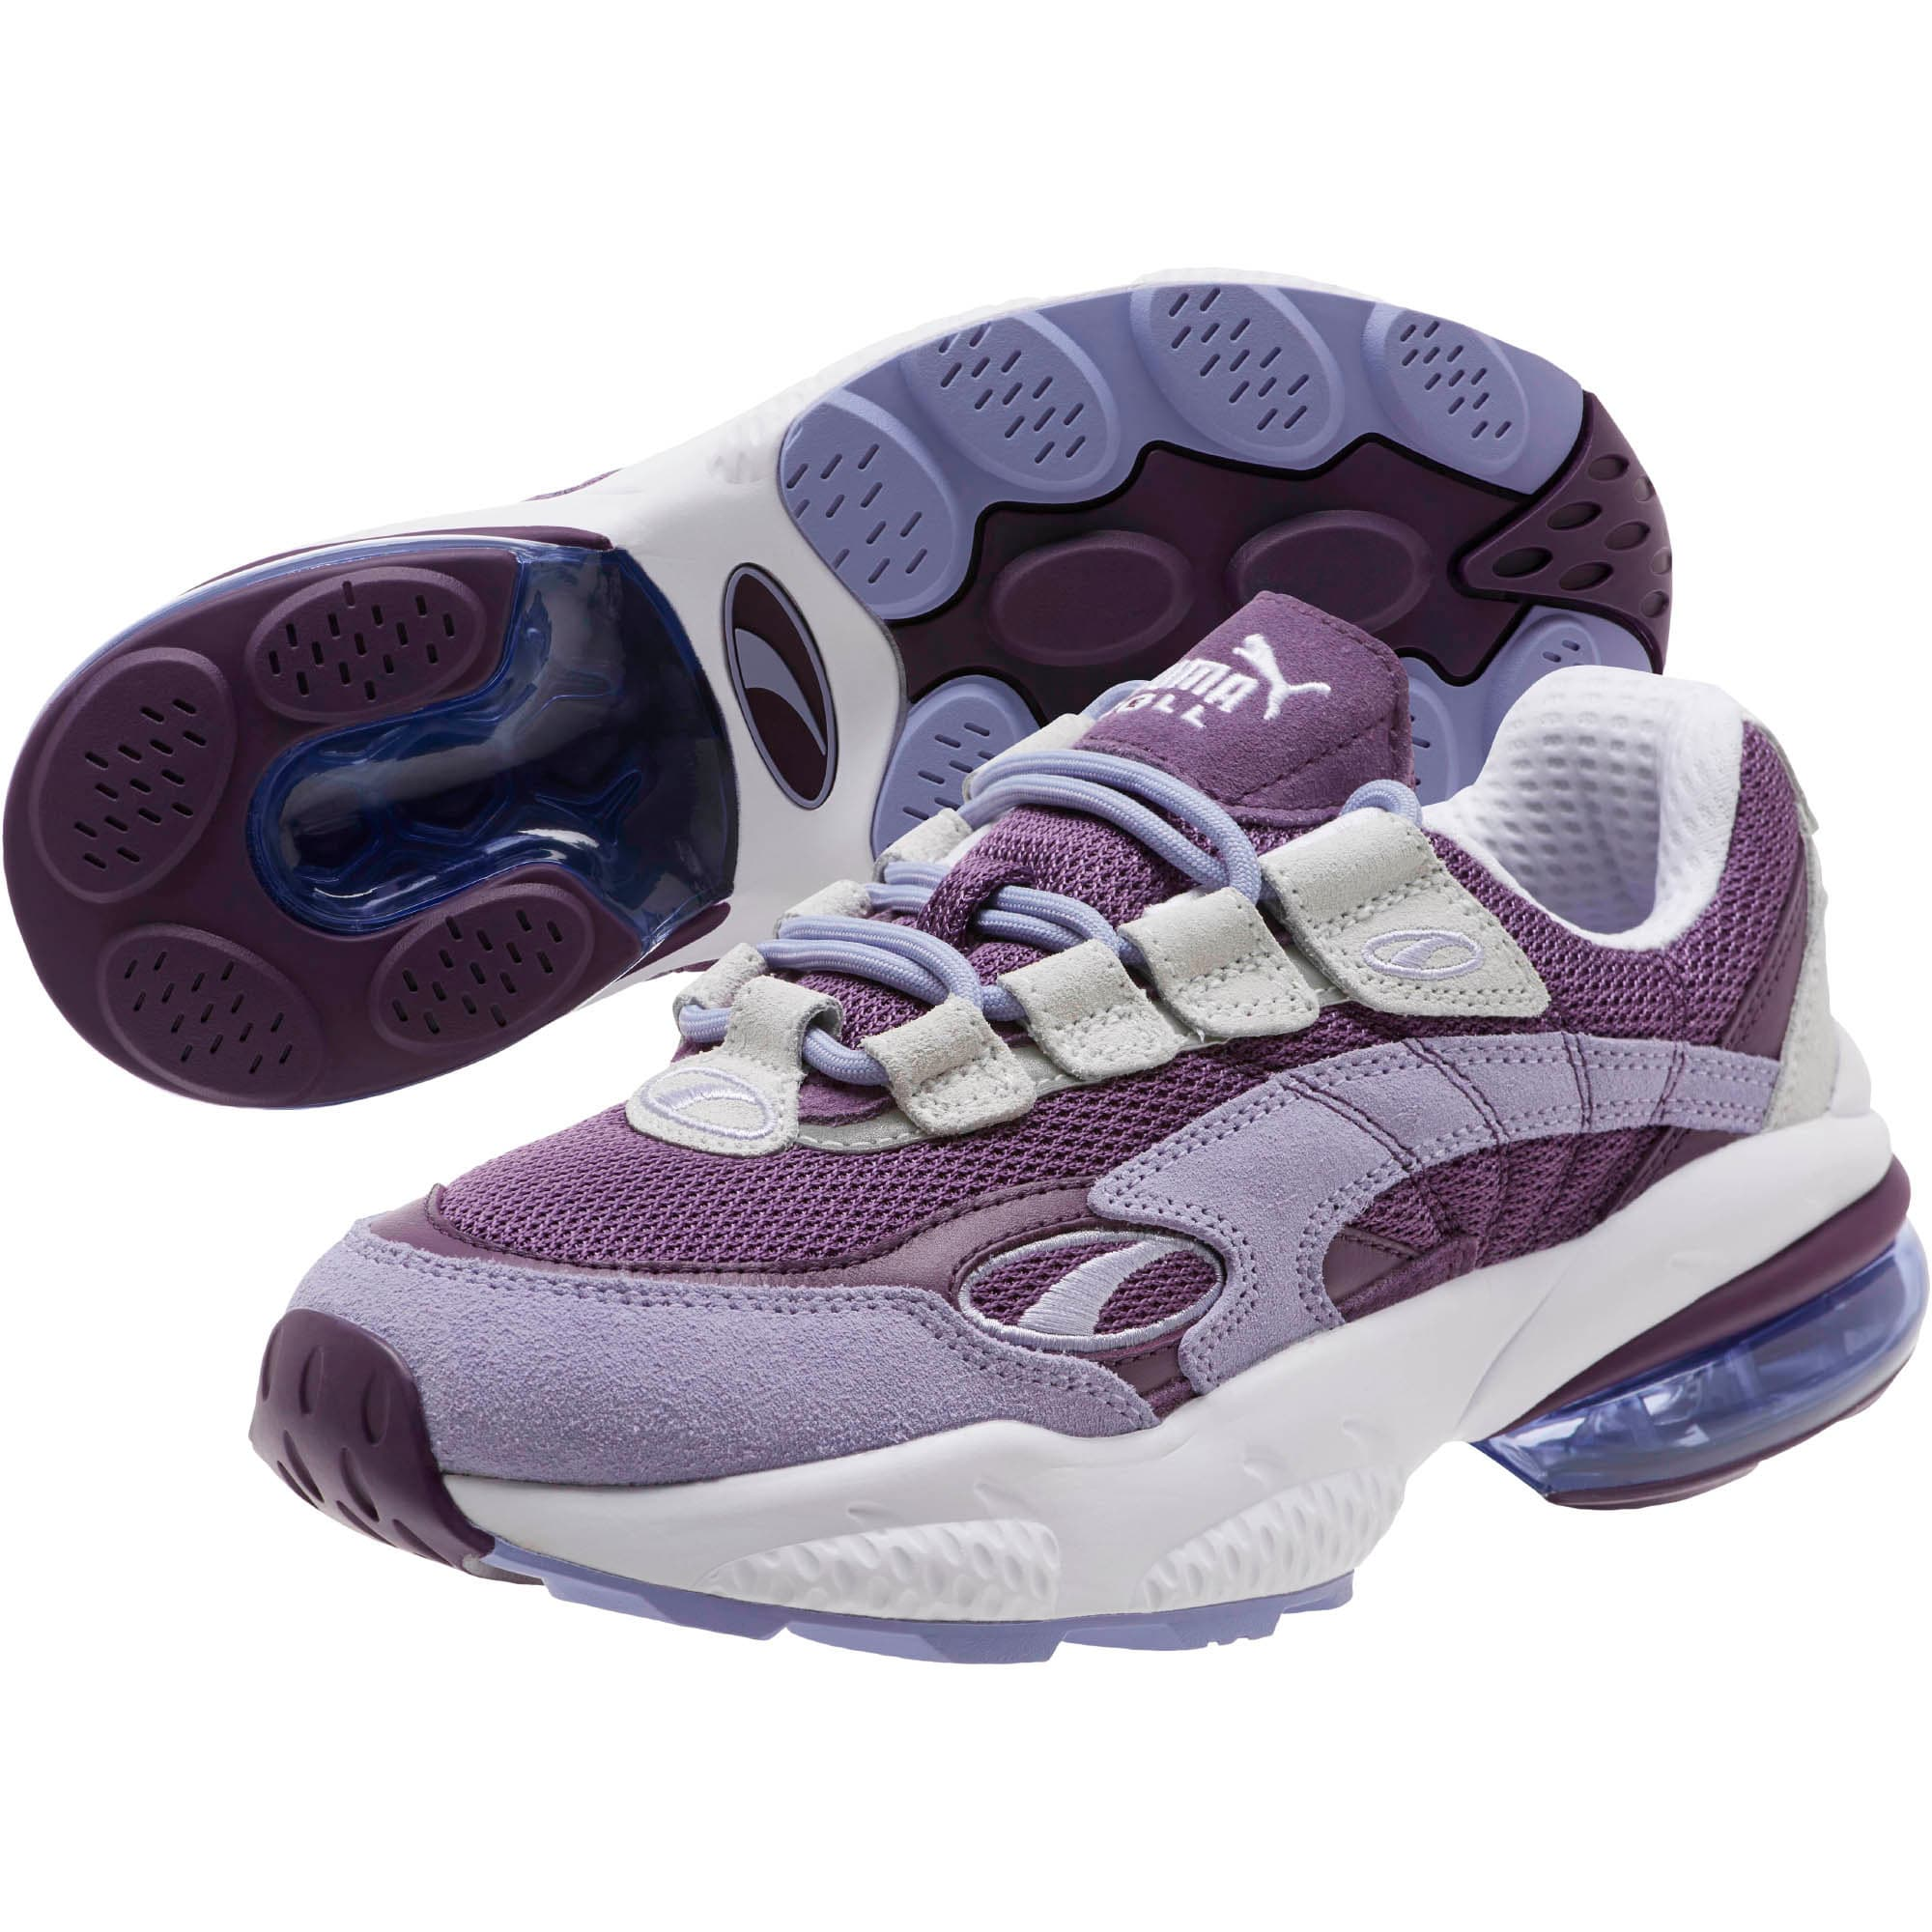 Thumbnail 2 of CELL Venom Women's Sneakers, Sweet Lavender-Indigo, medium